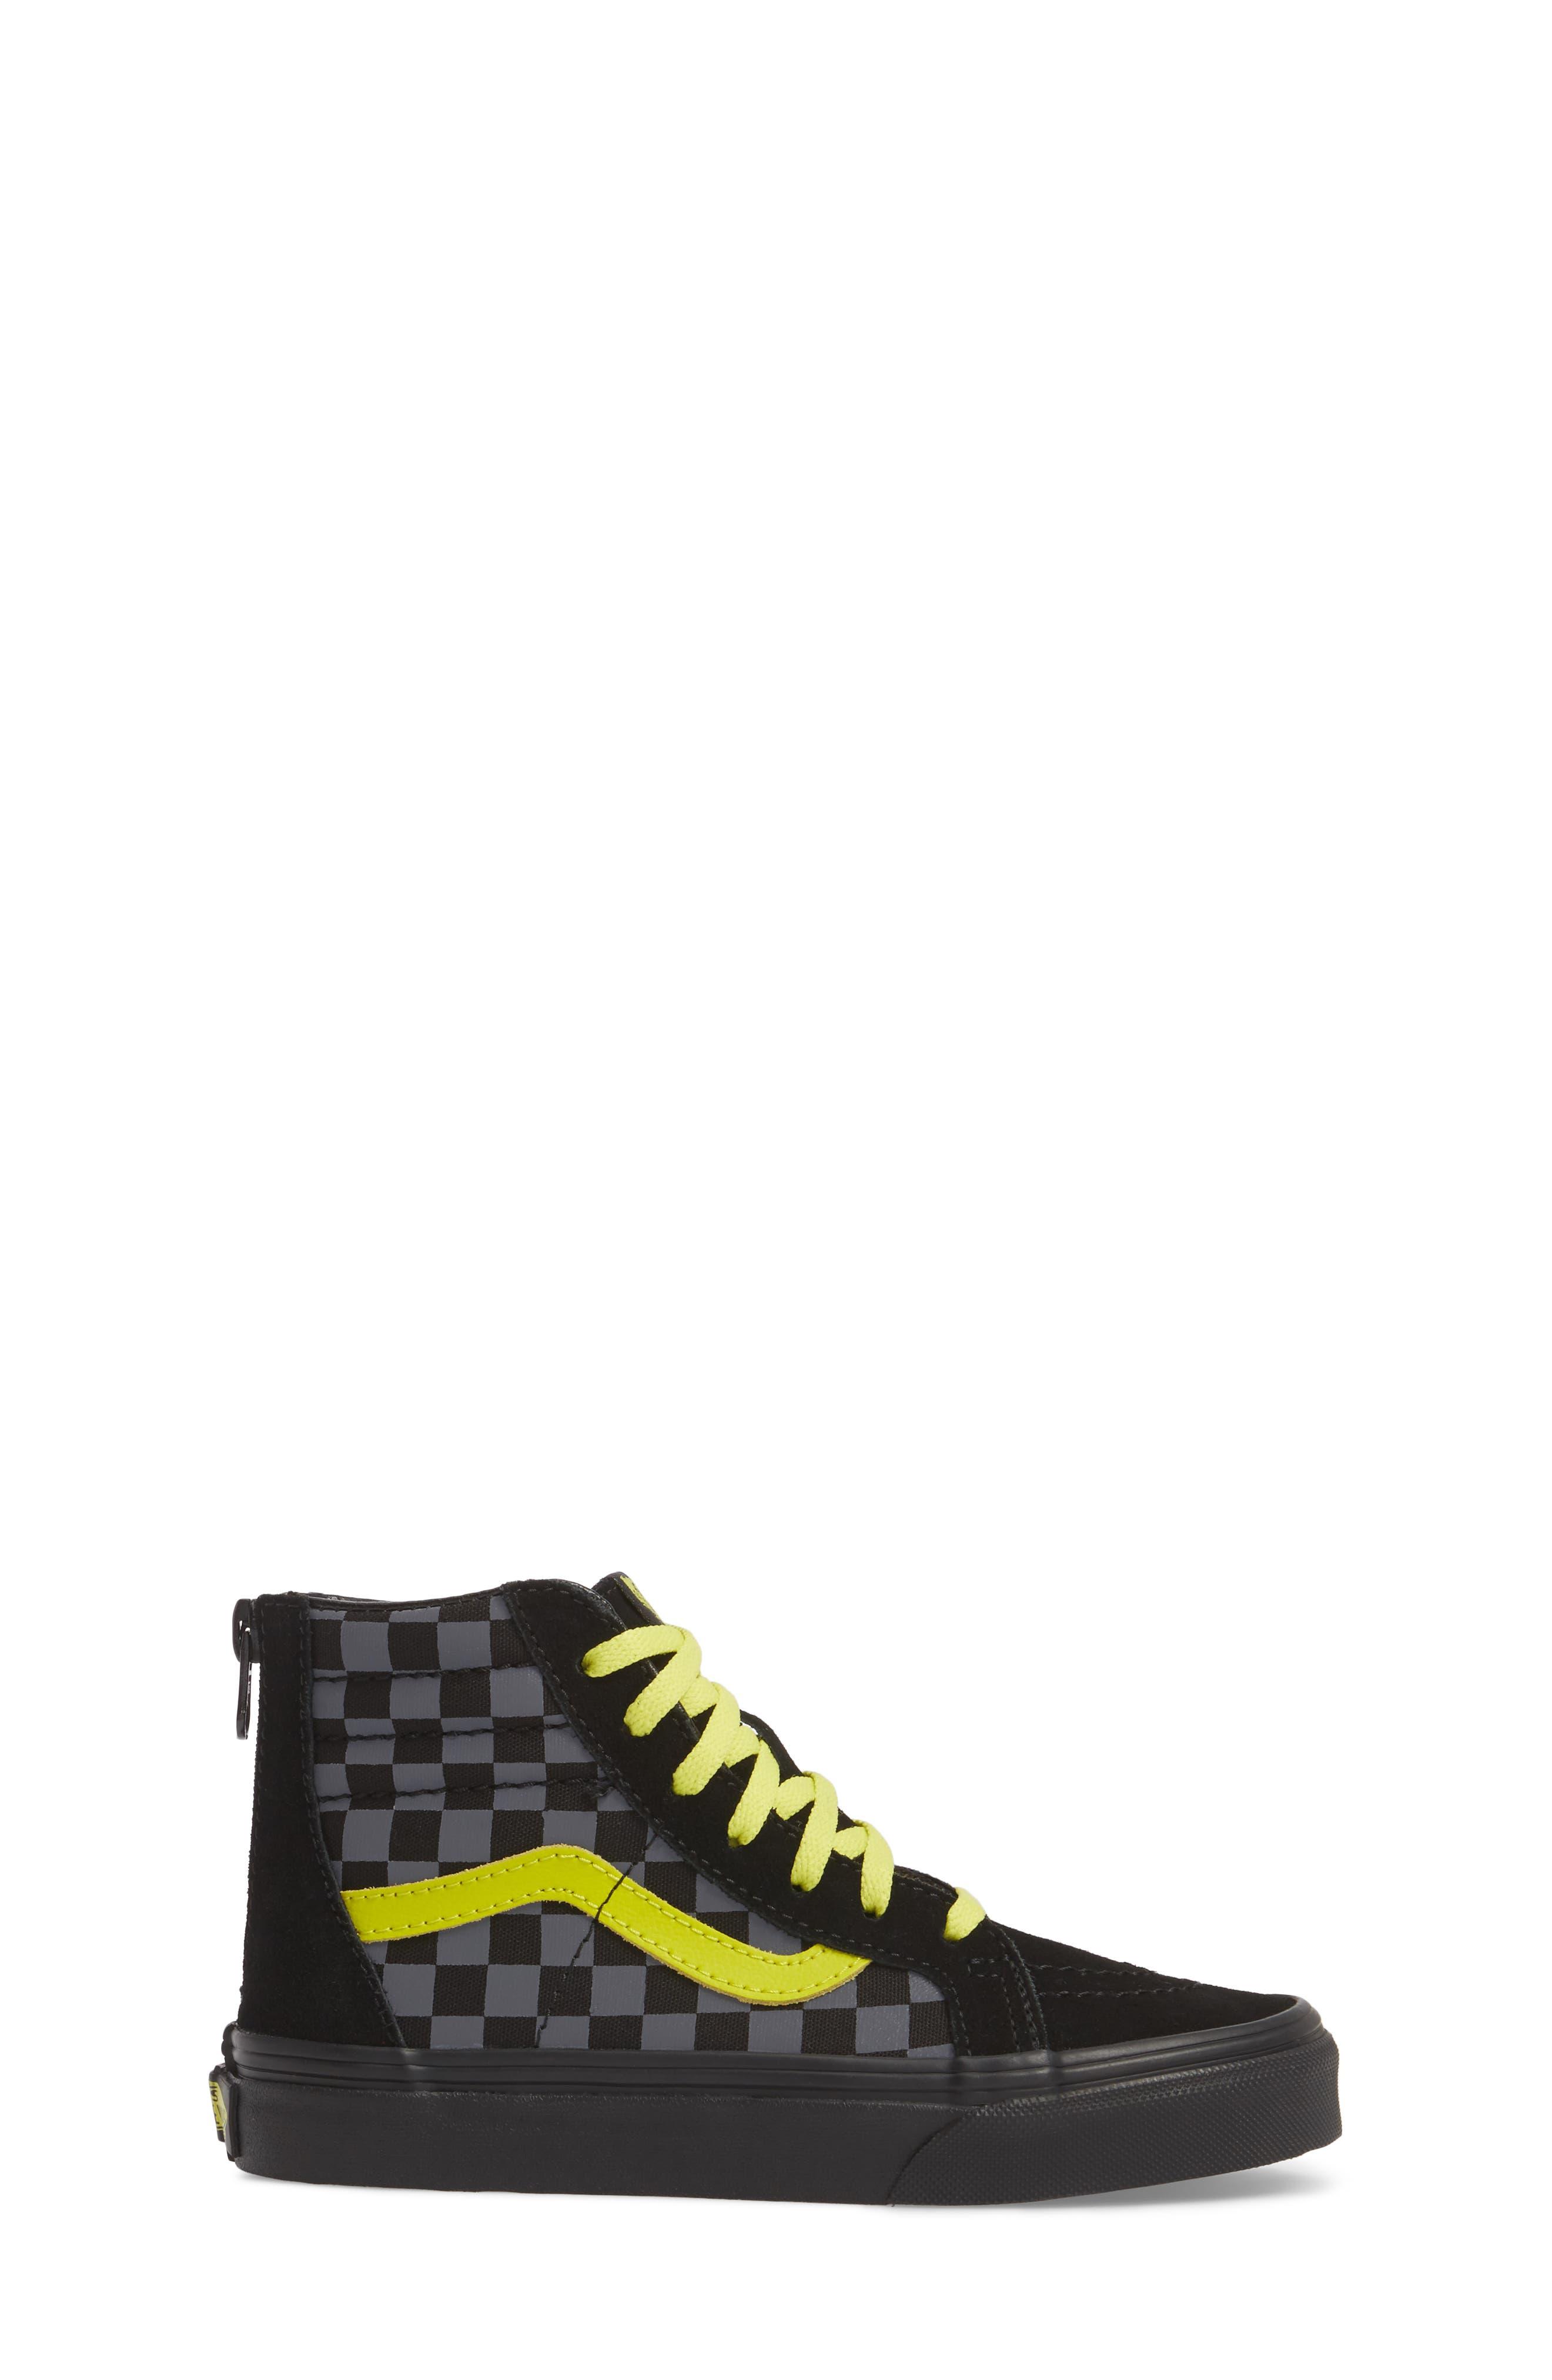 Reflective Checkerboard SK8-Hi Zip Sneaker,                             Alternate thumbnail 3, color,                             Asphalt/ Reflective